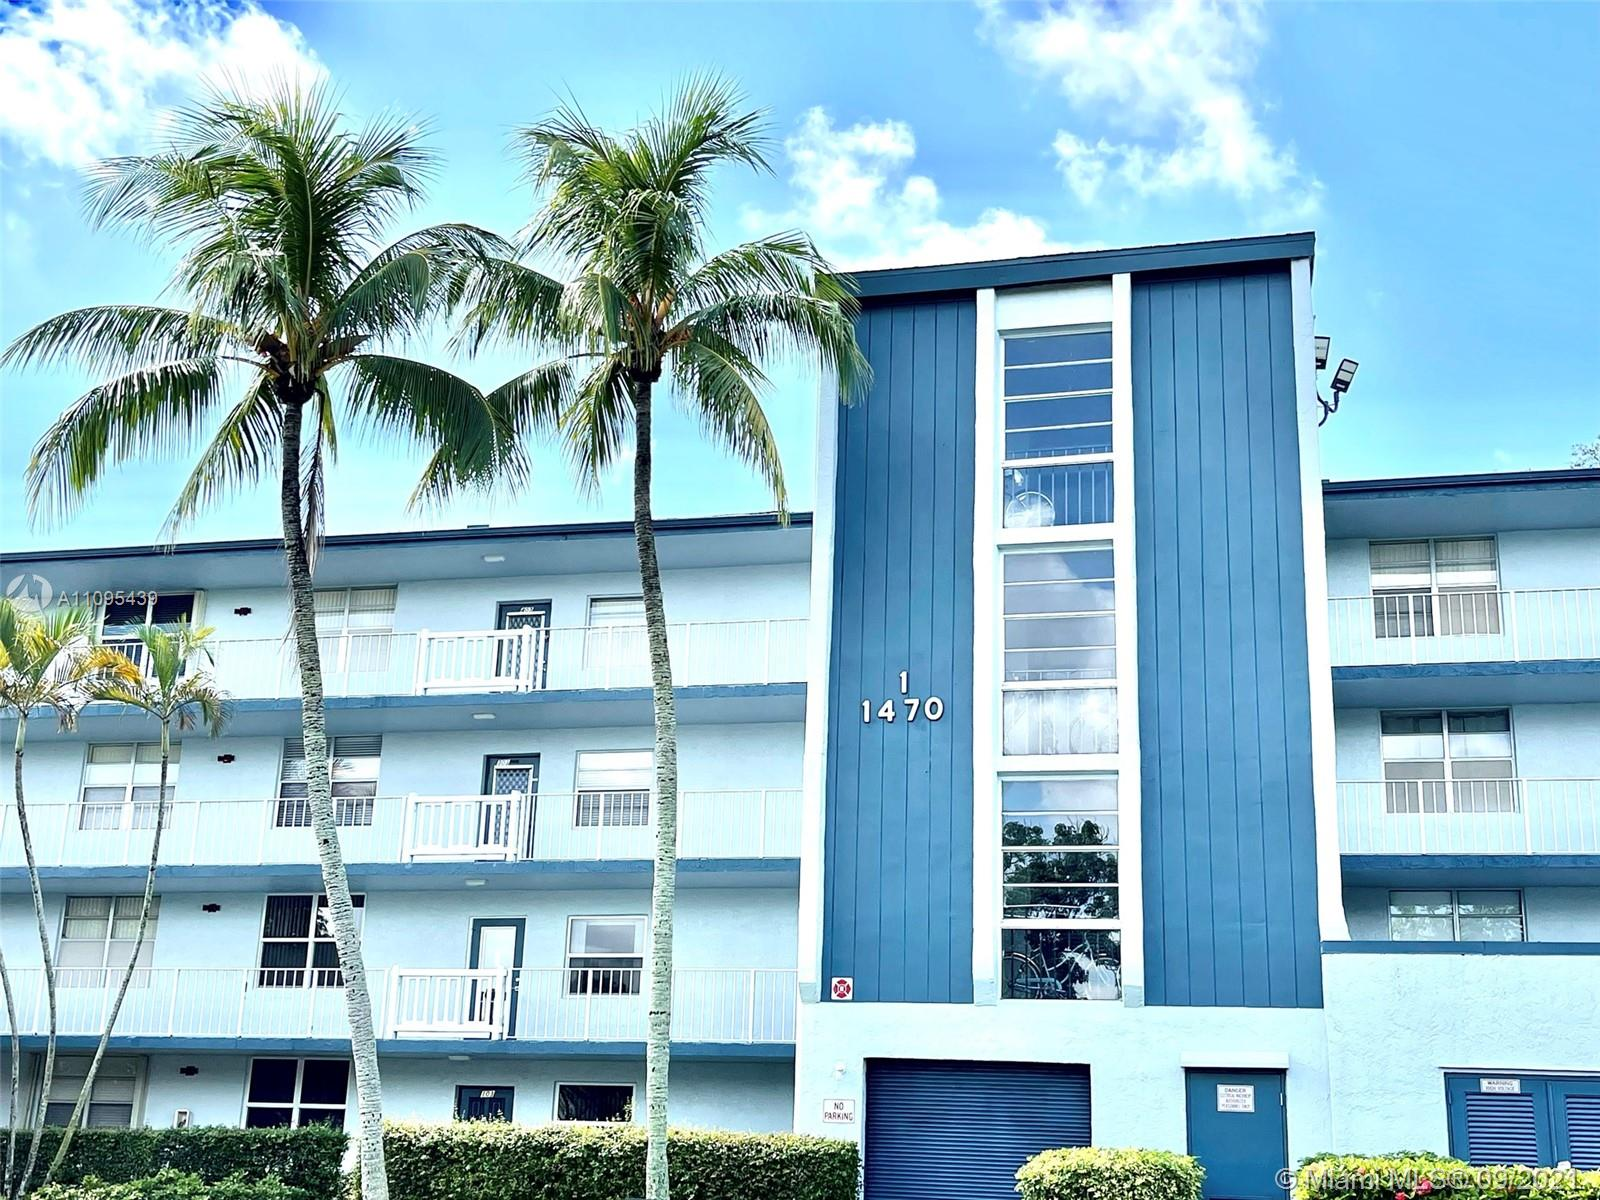 1470 80th Ave Unit 201, Margate, Florida 33063